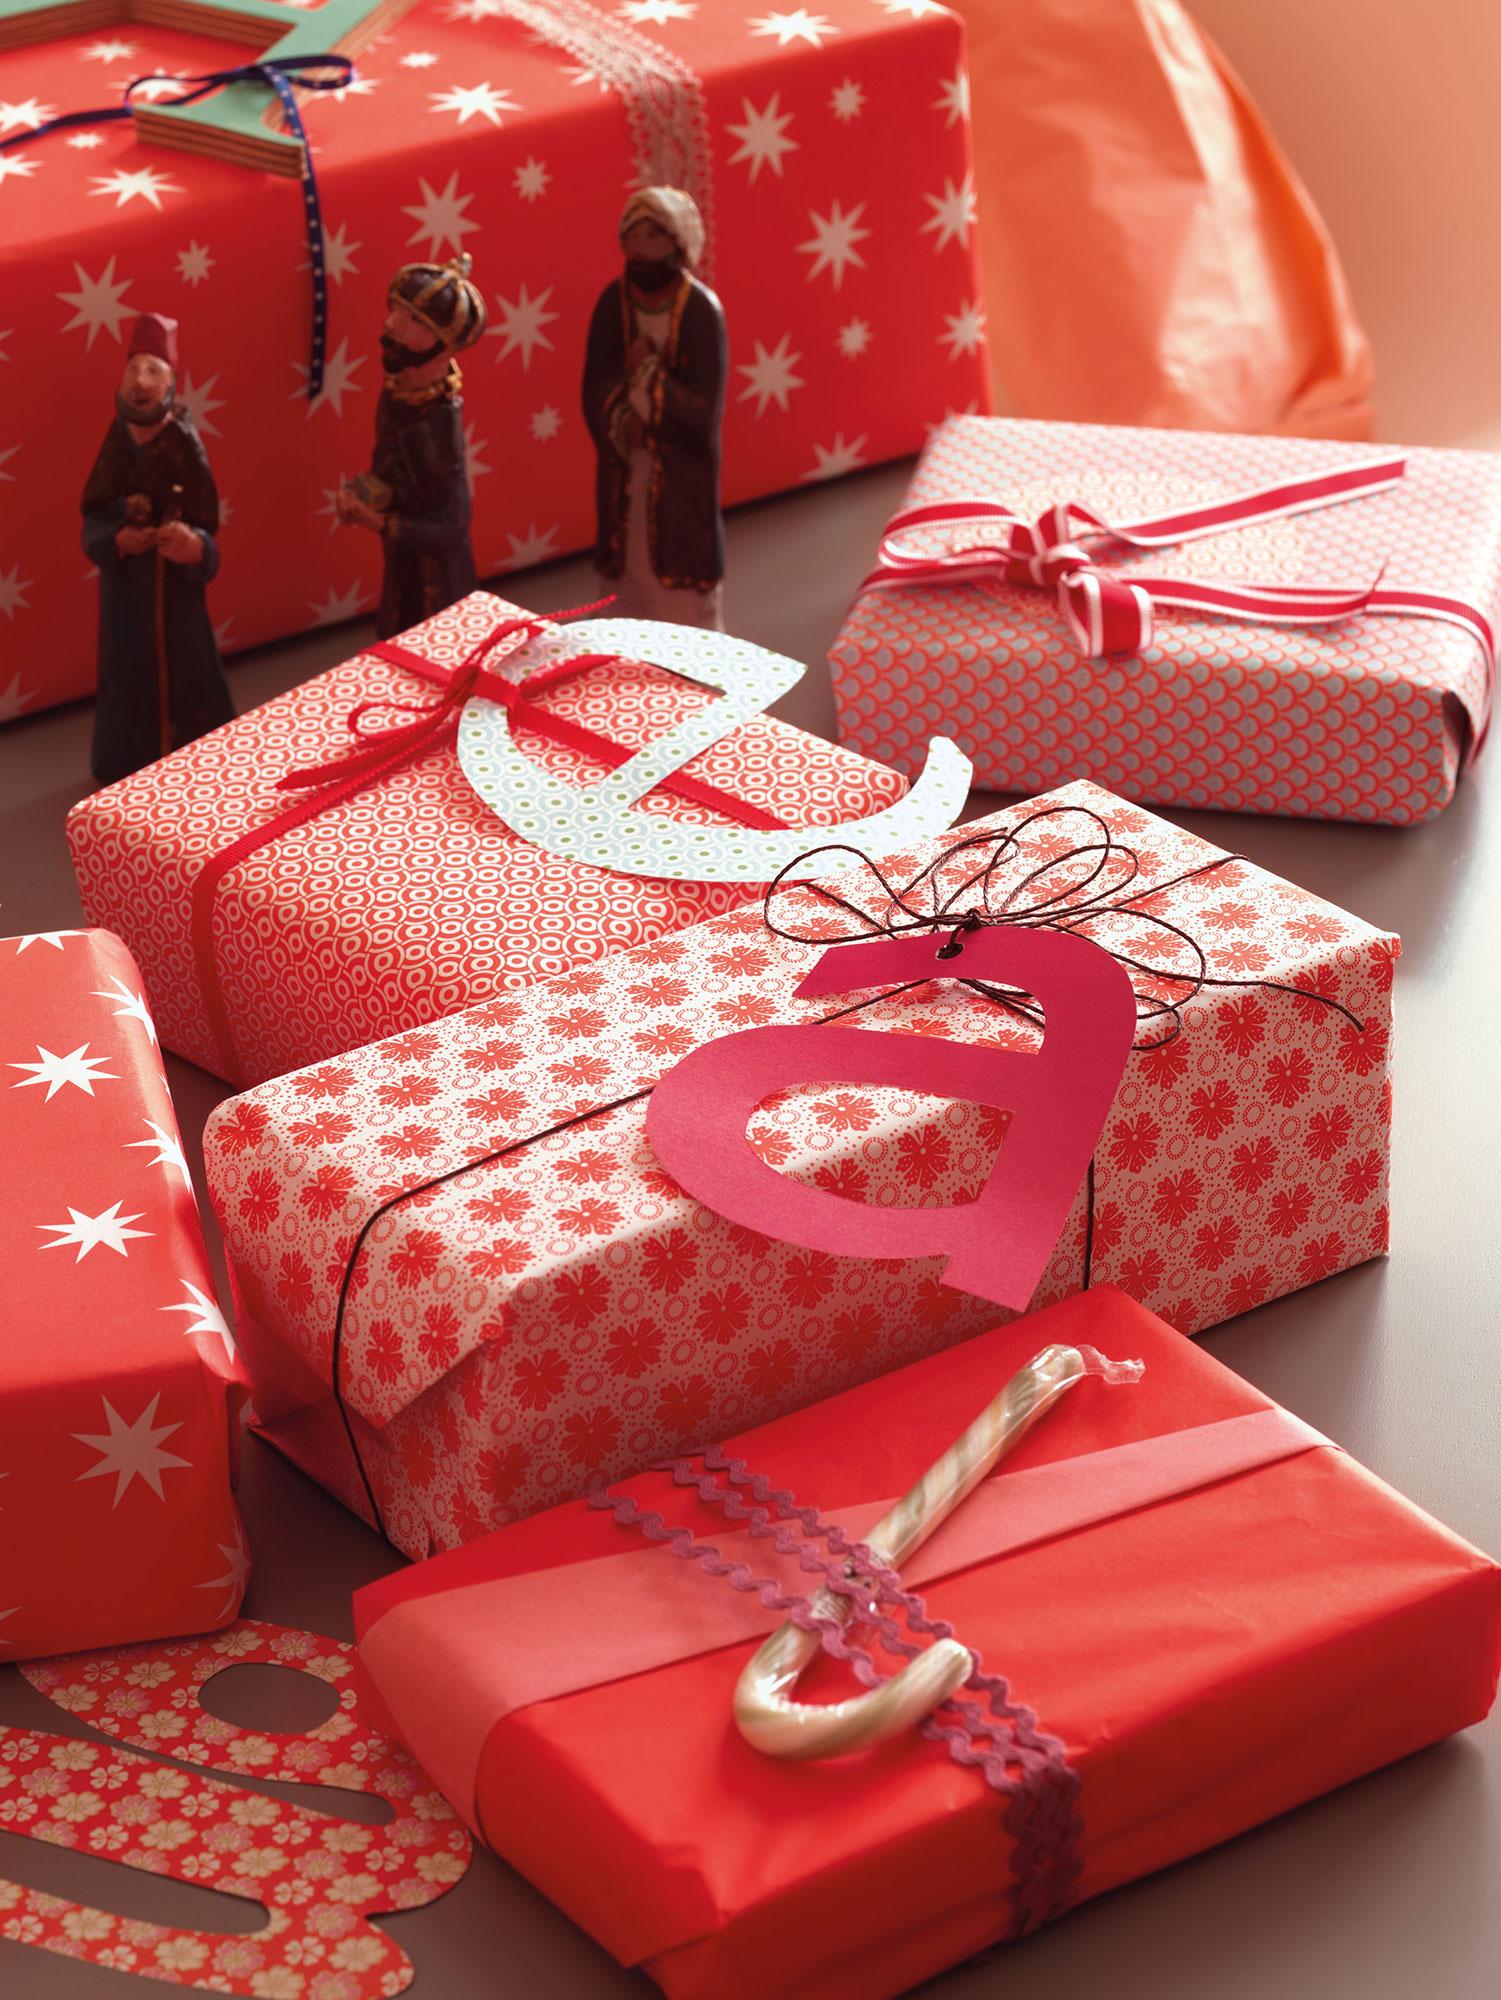 106 fotos de manualidades de navidad for Detalles de navidad